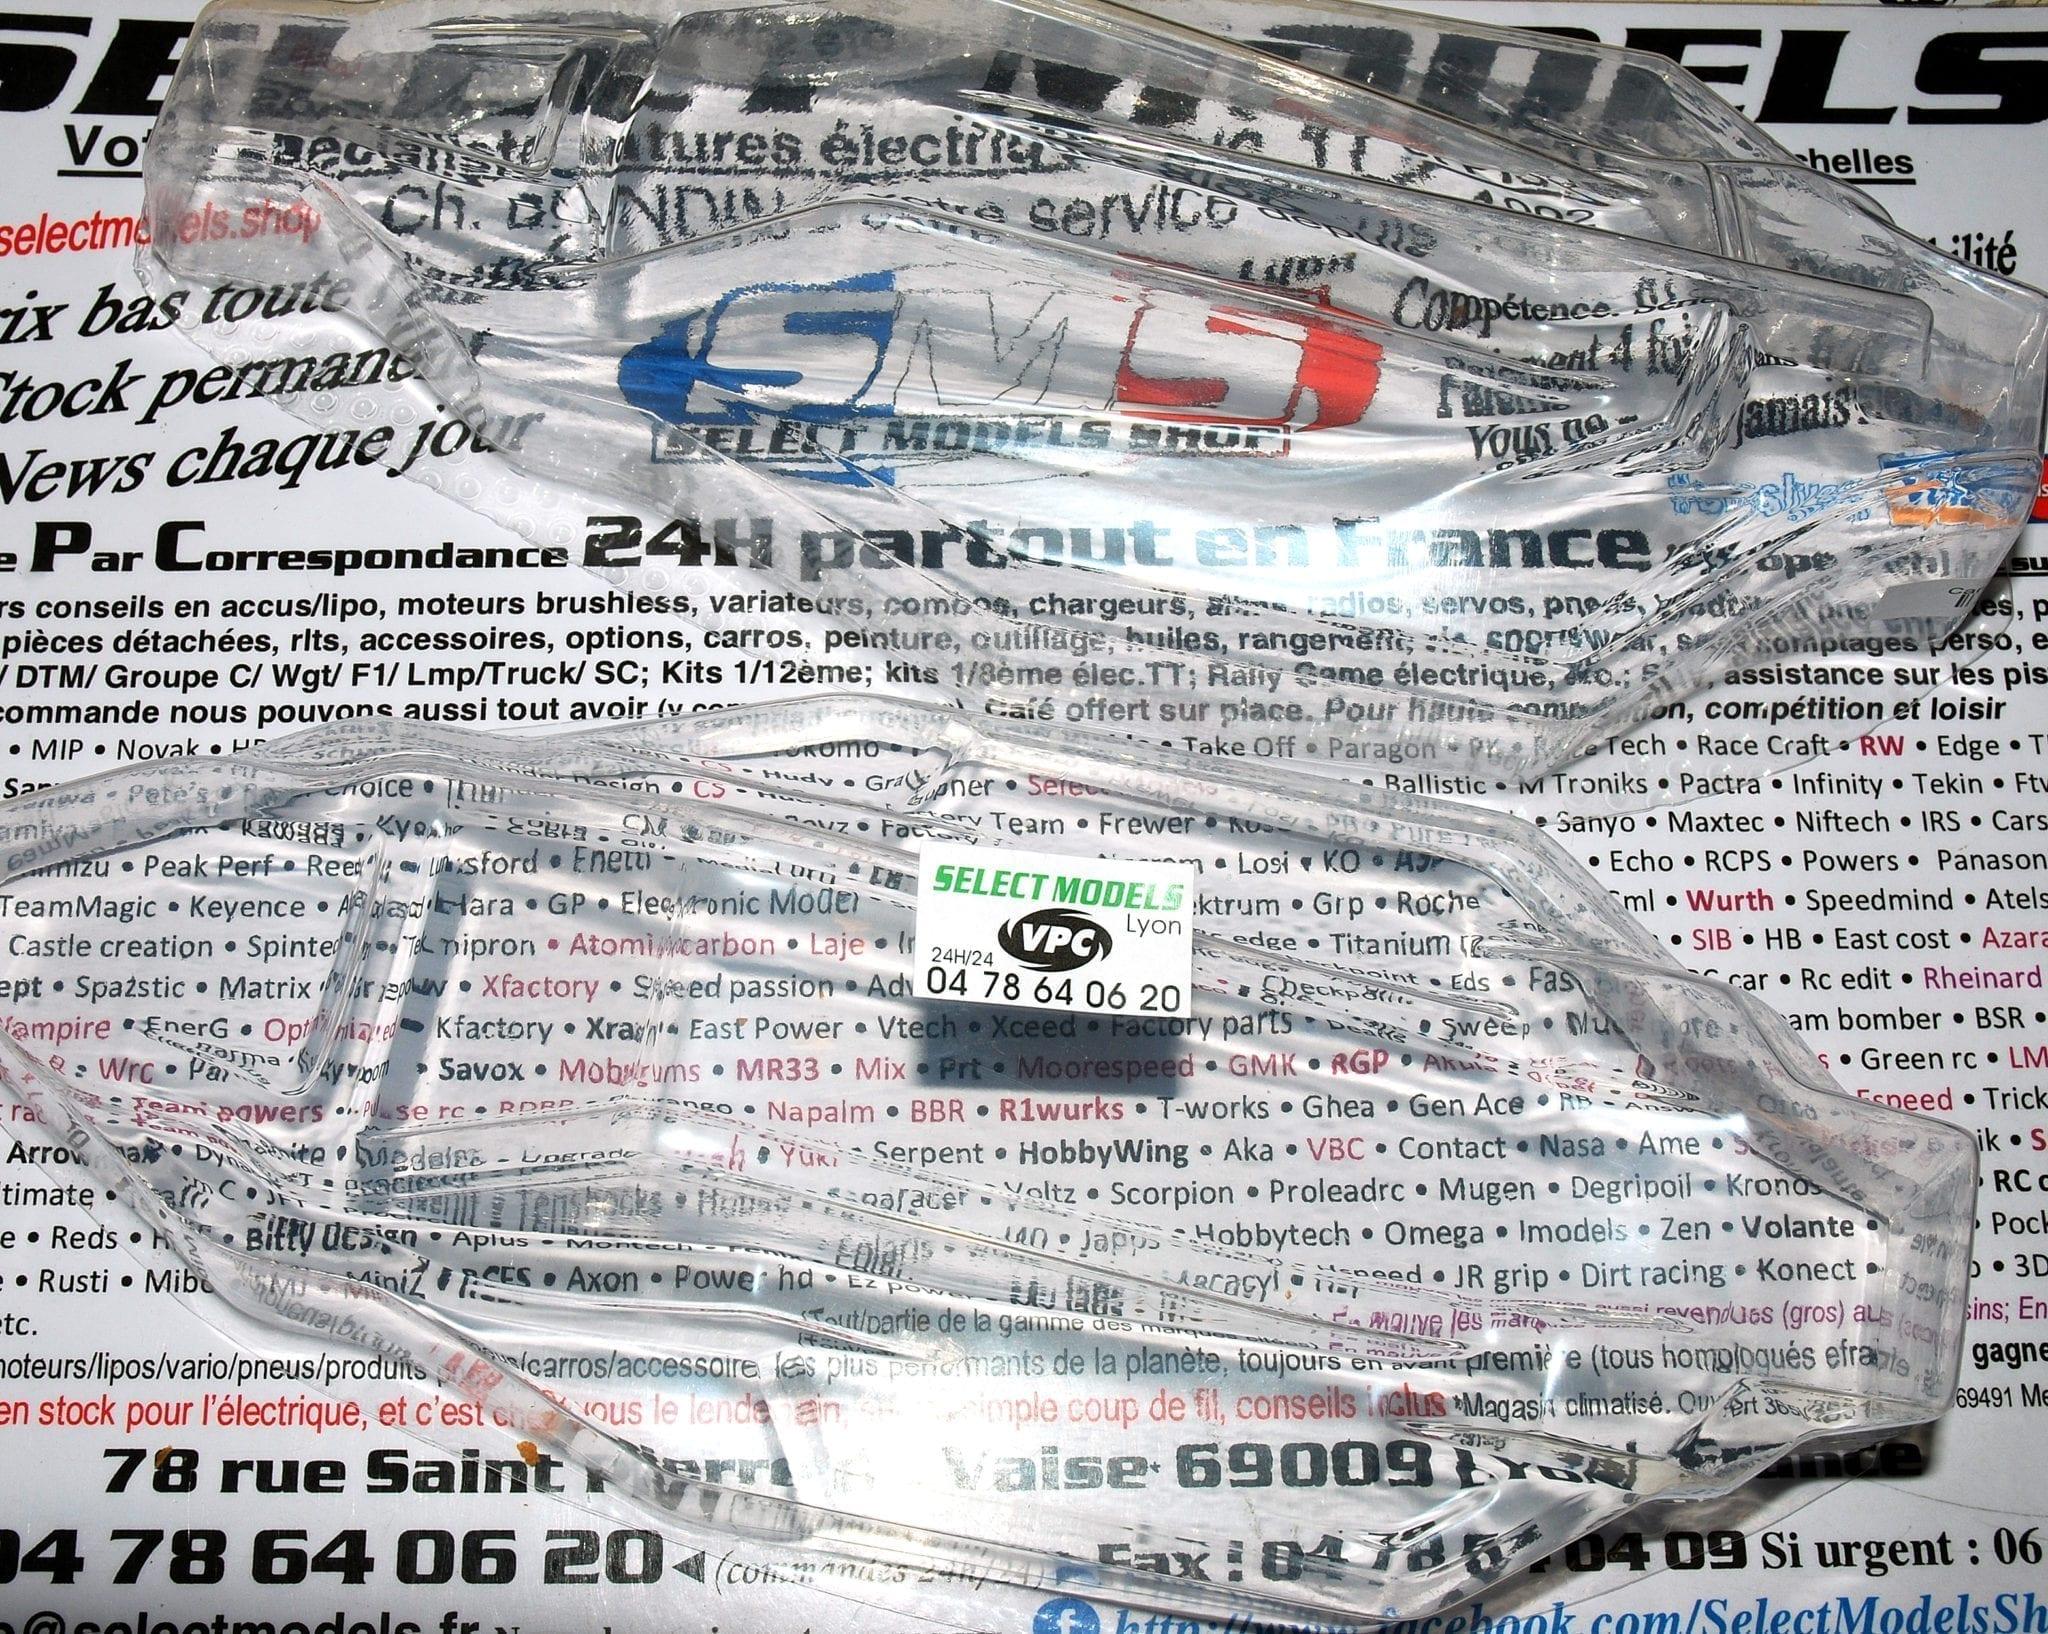 Carro 6mik xb2c 19 et b6.1